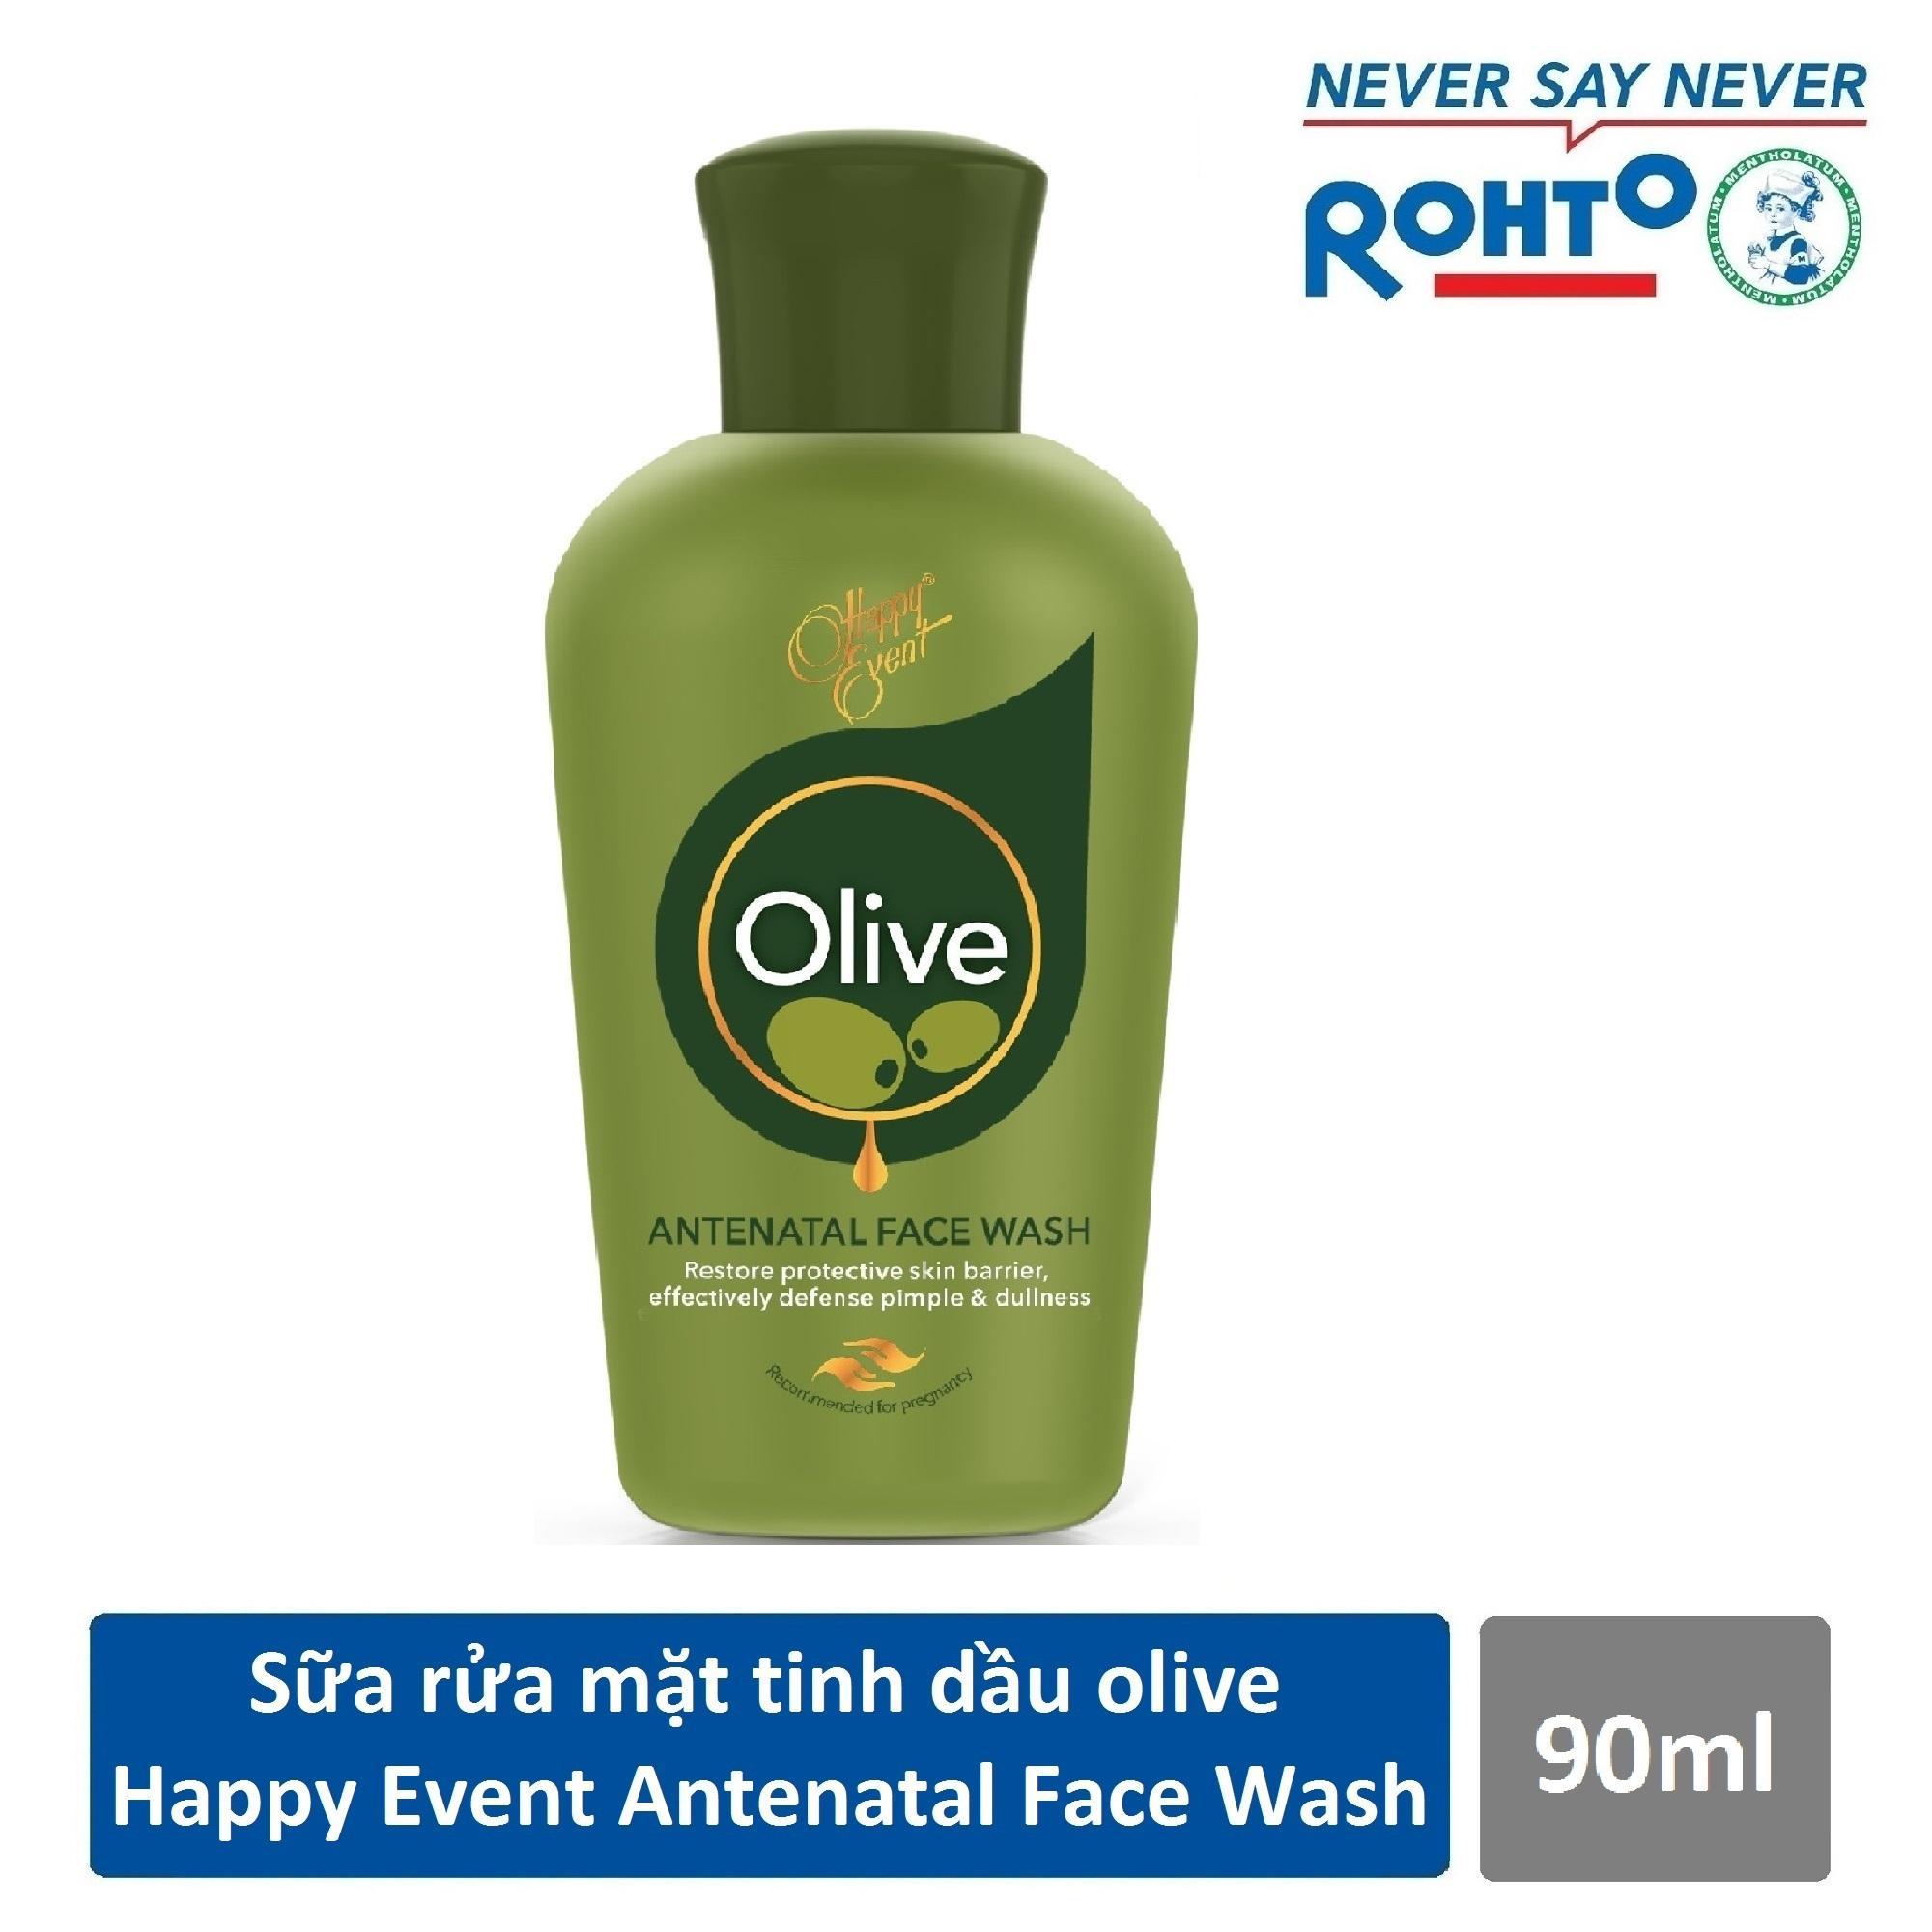 Hình ảnh Sữa rửa mặt tinh dầu olive ngừa mụn Happy Event Antenatal Face Wash 90ml